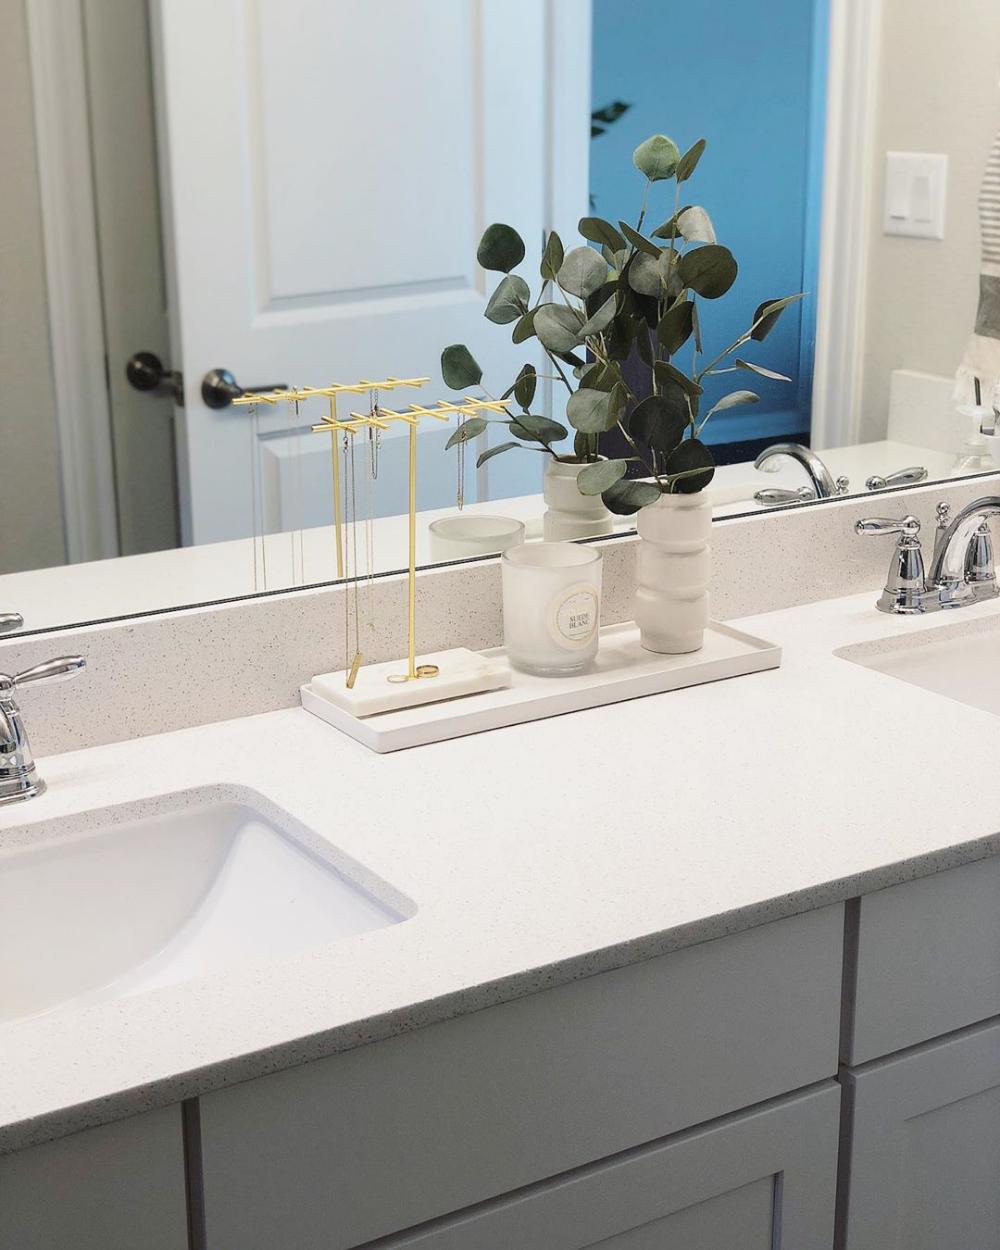 Cb2 Hashtag On Instagram Photos And Videos Bathroom Tray Bathroom Dining Ware [ 1250 x 1000 Pixel ]